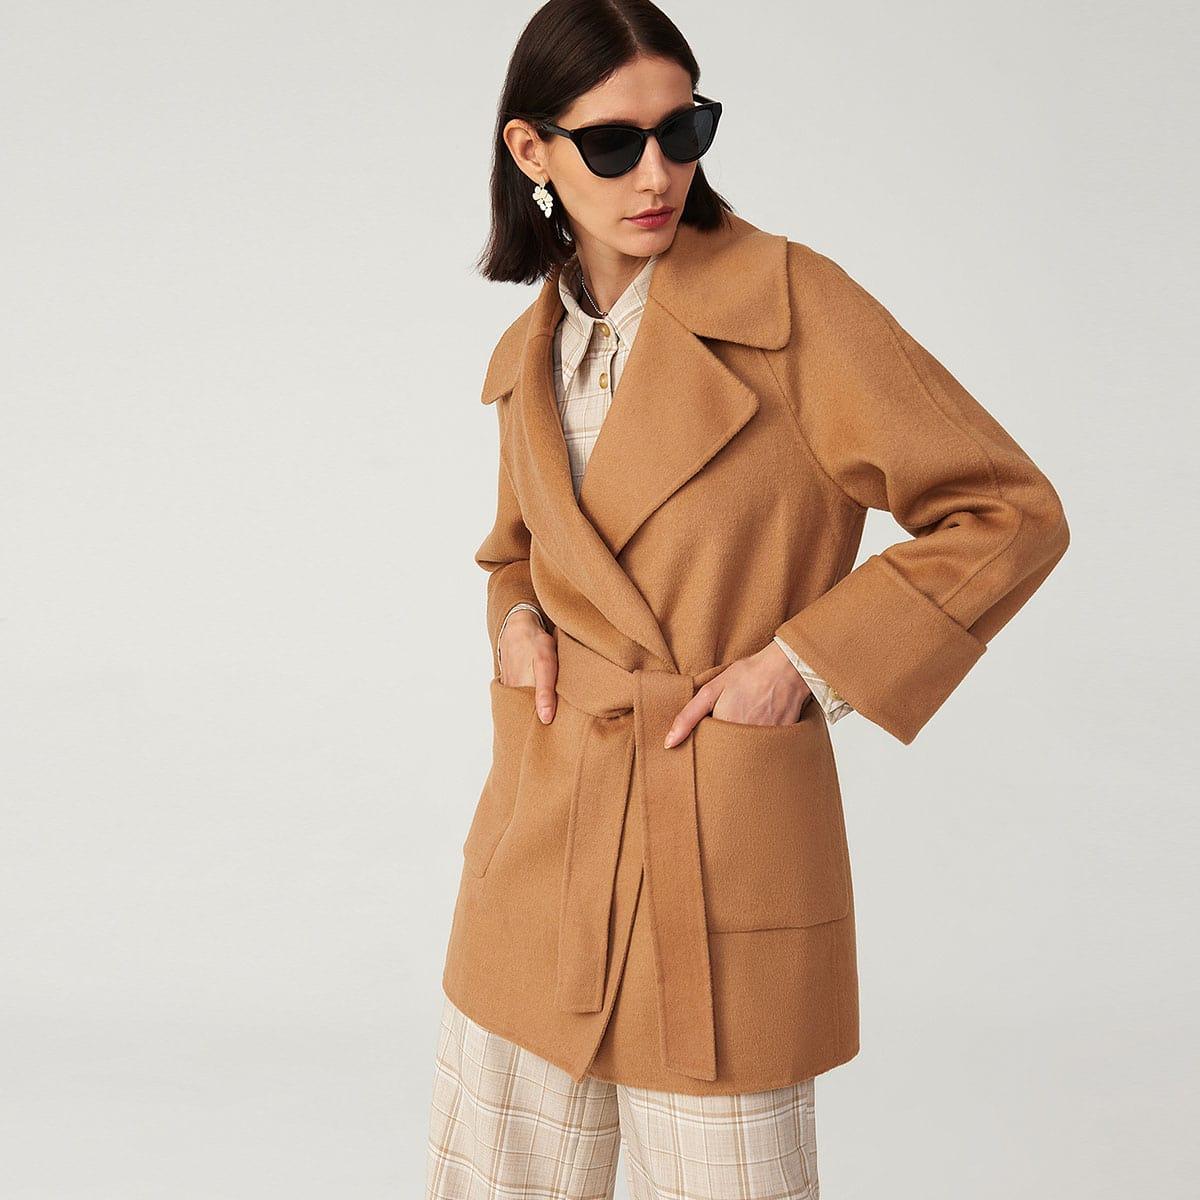 Raglan Sleeve Patch Pocket Belted Overcoat